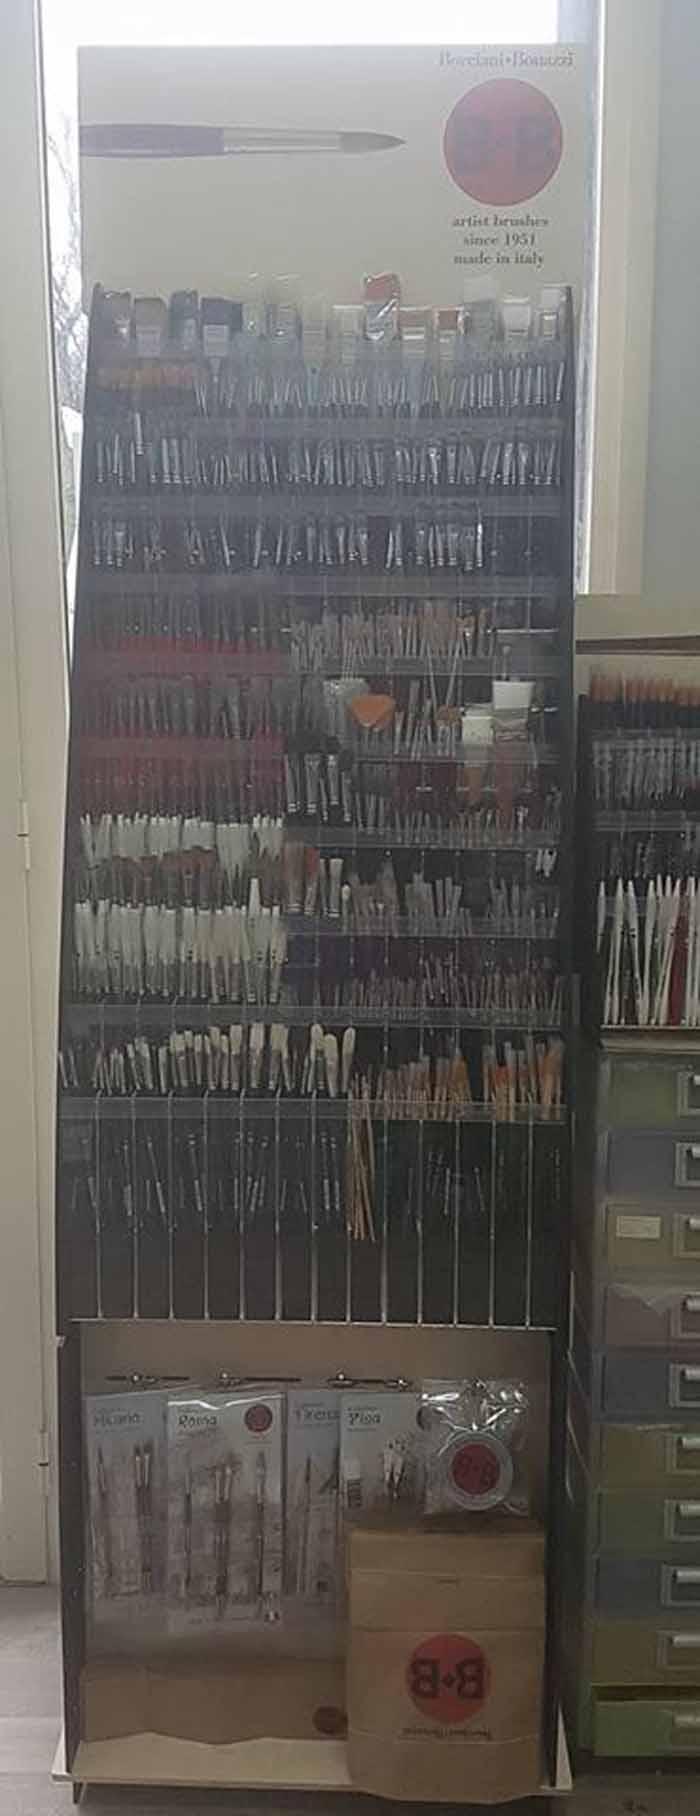 spazzole a forma di penna